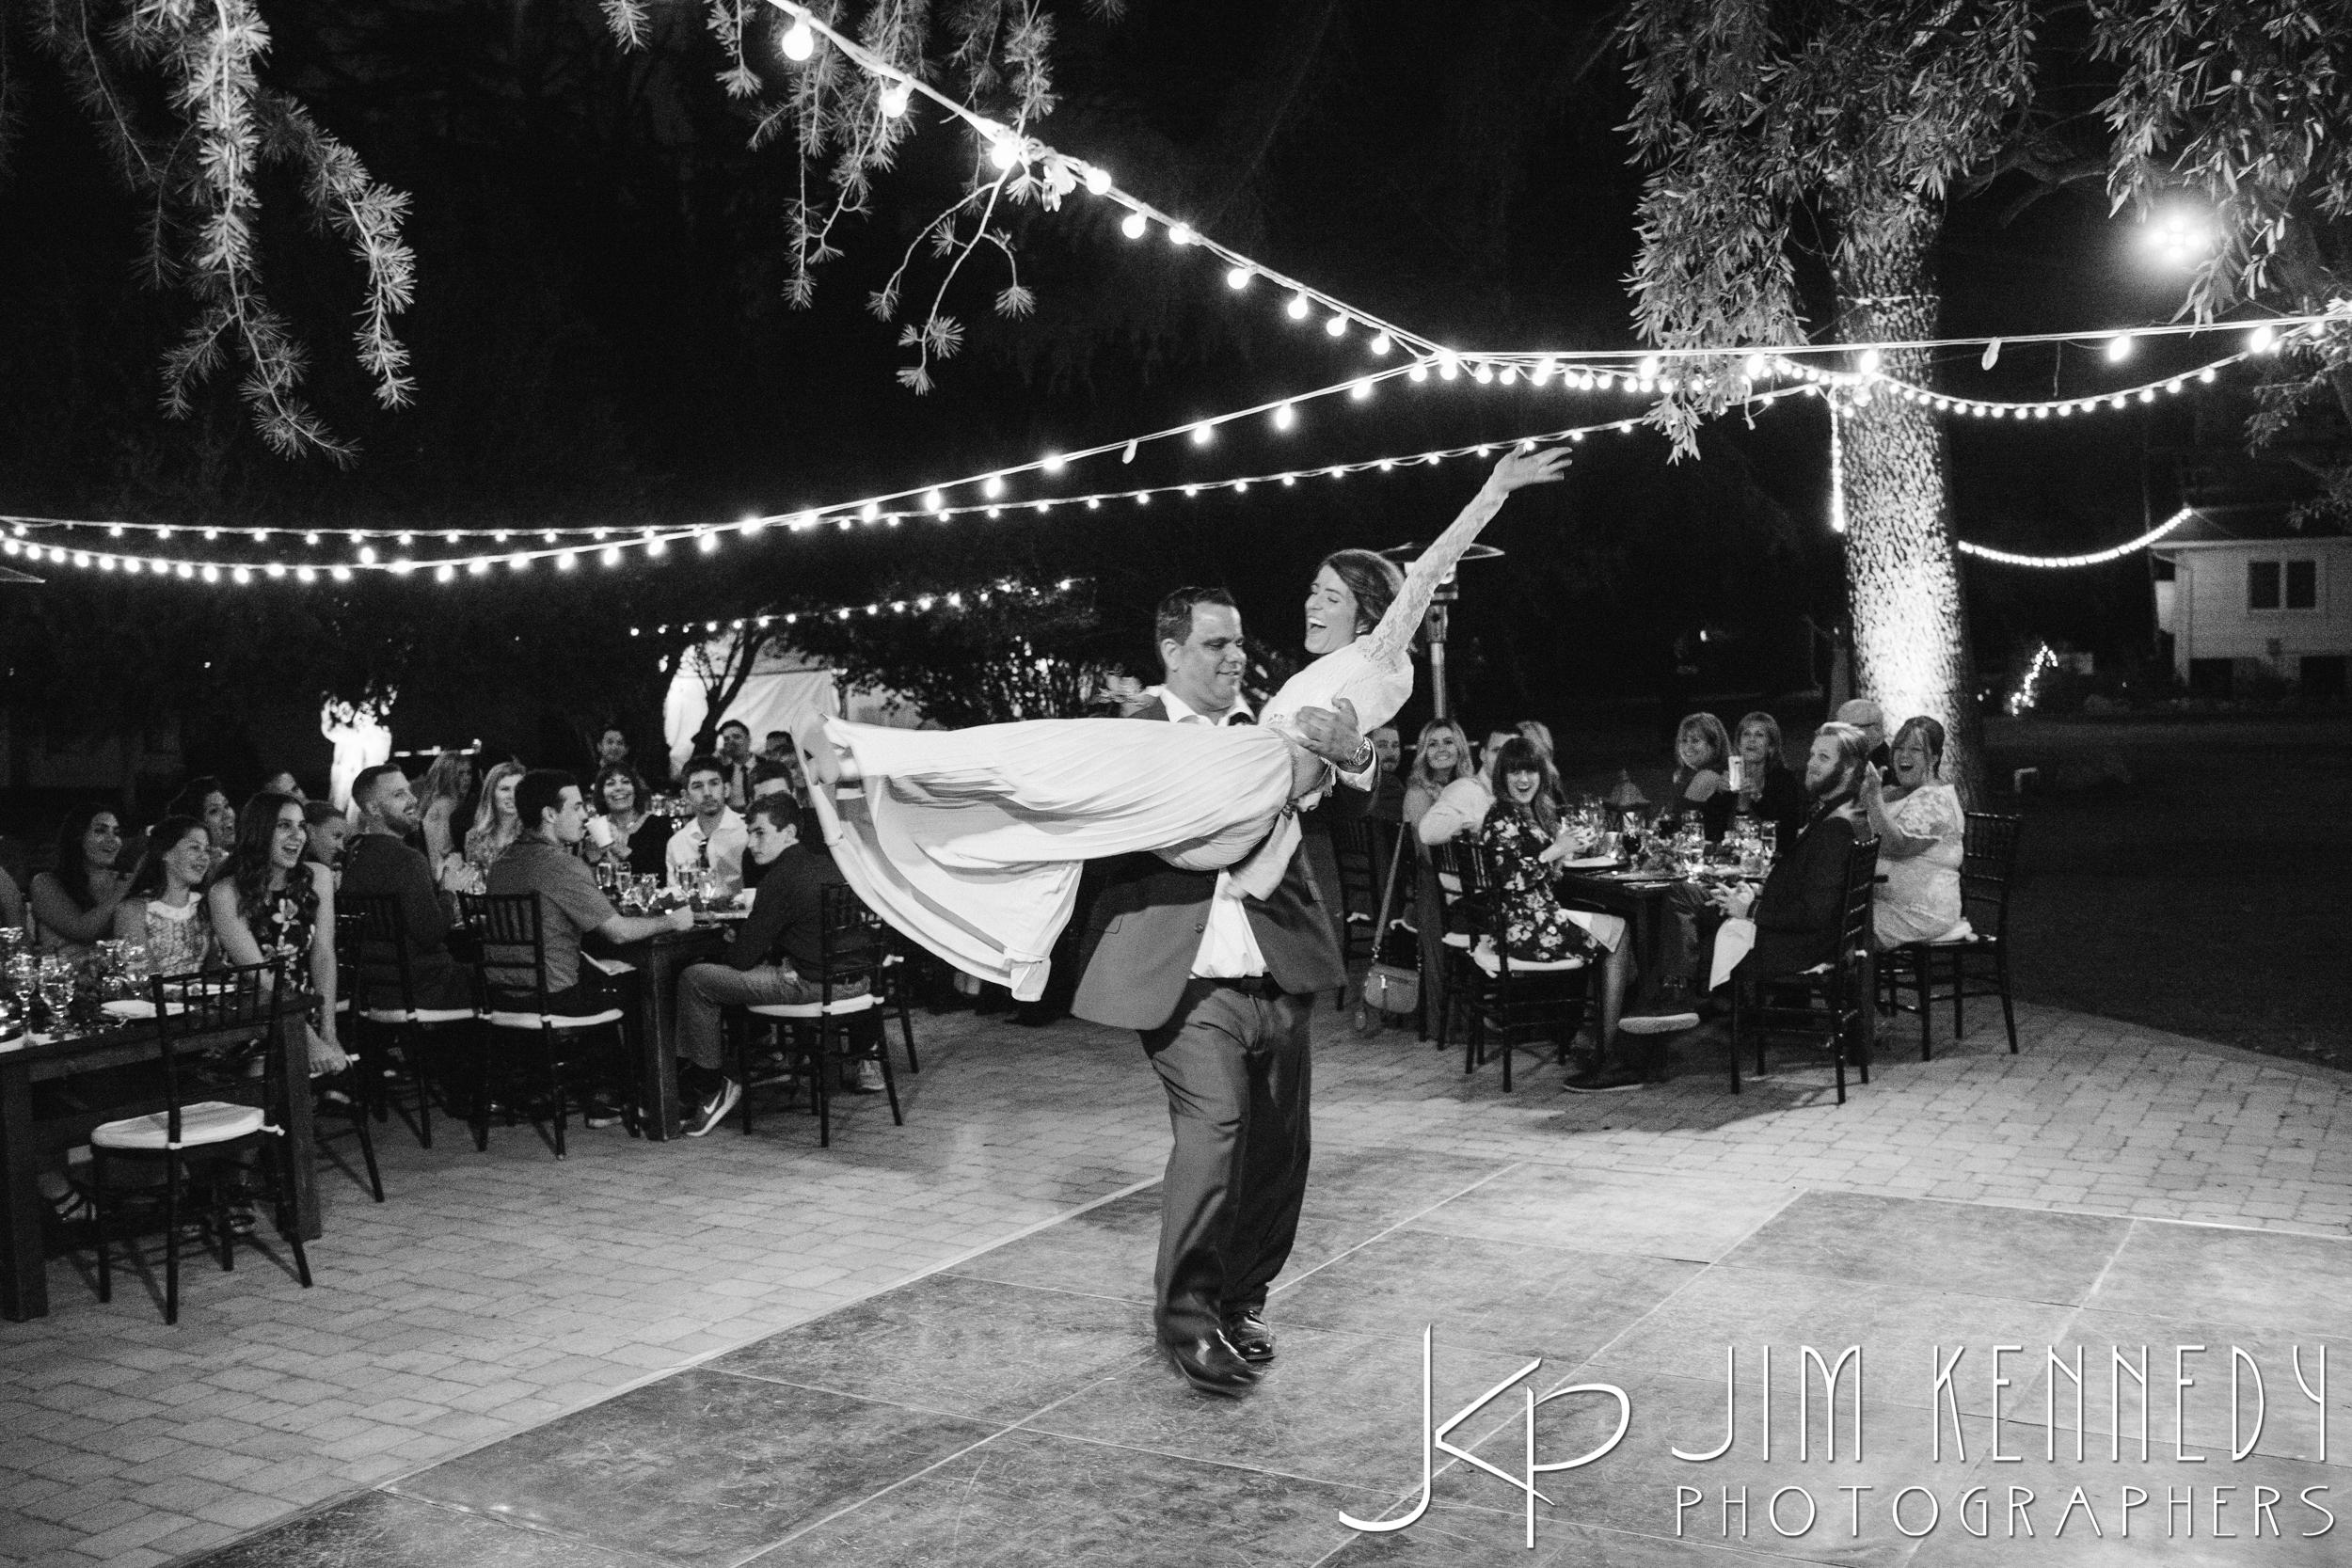 jim_kennedy_photographers_highland_springs_wedding_caitlyn_0184.jpg